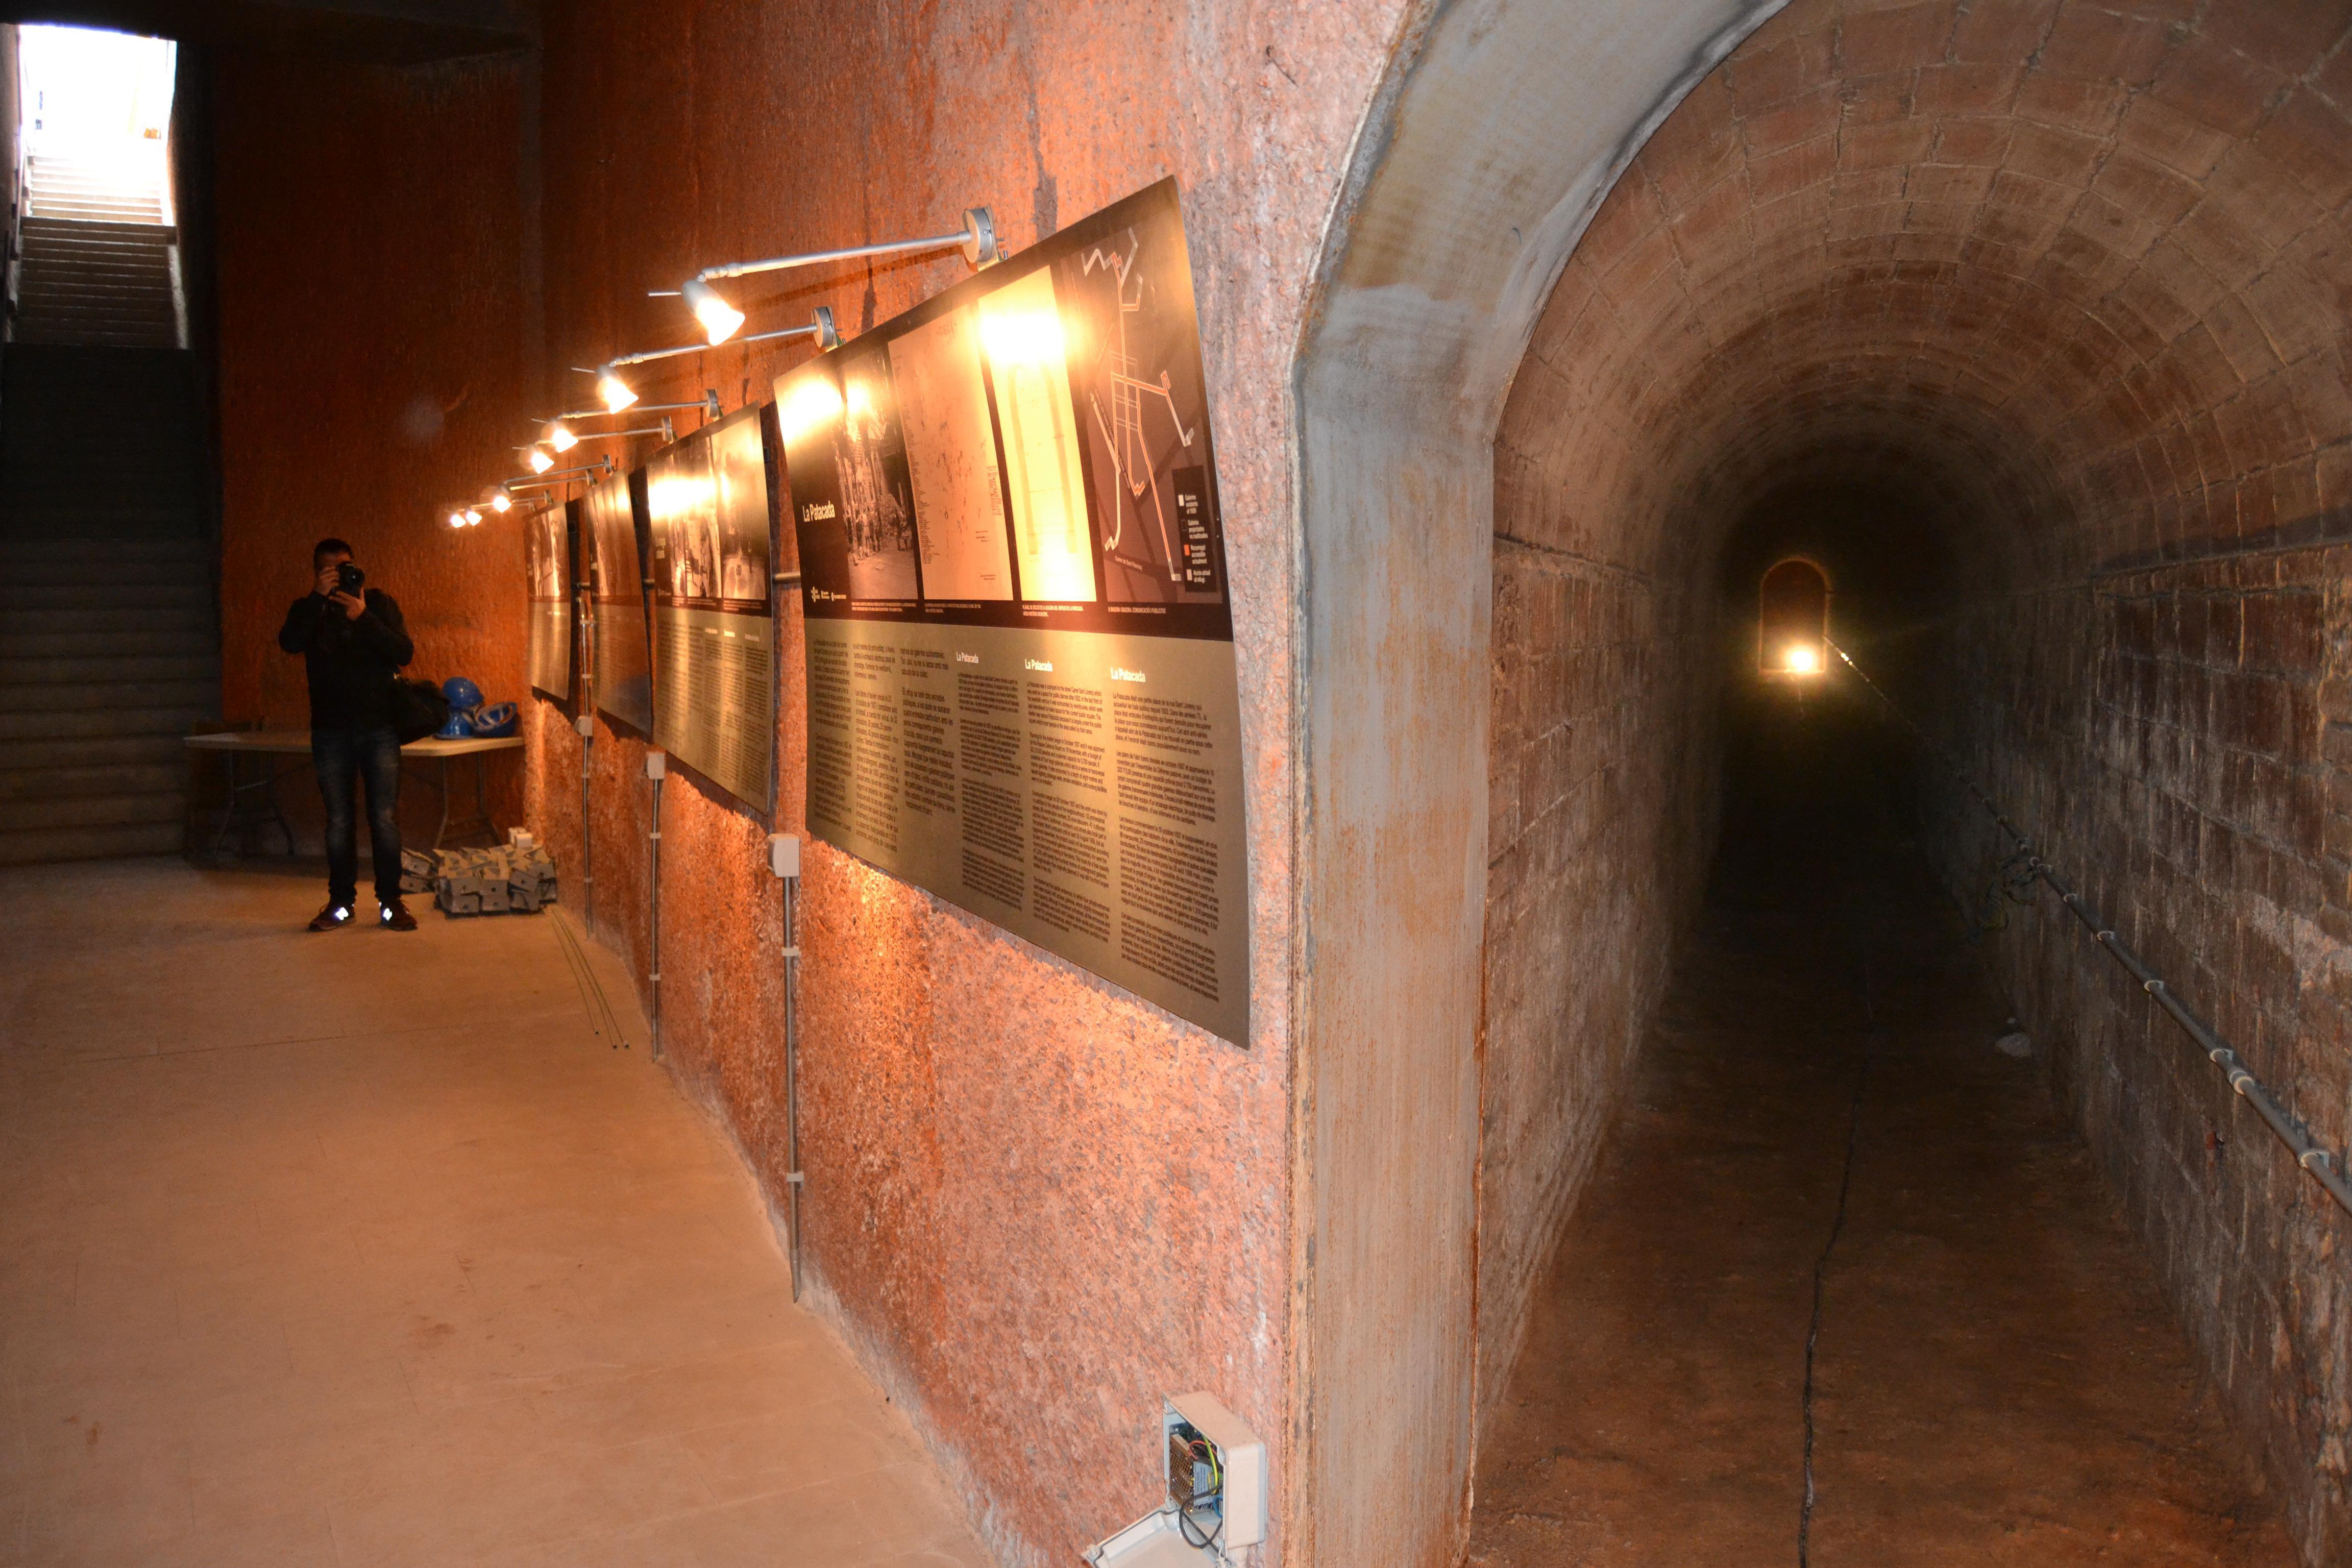 Visita guiada al refugi antiaeri de la Patacada